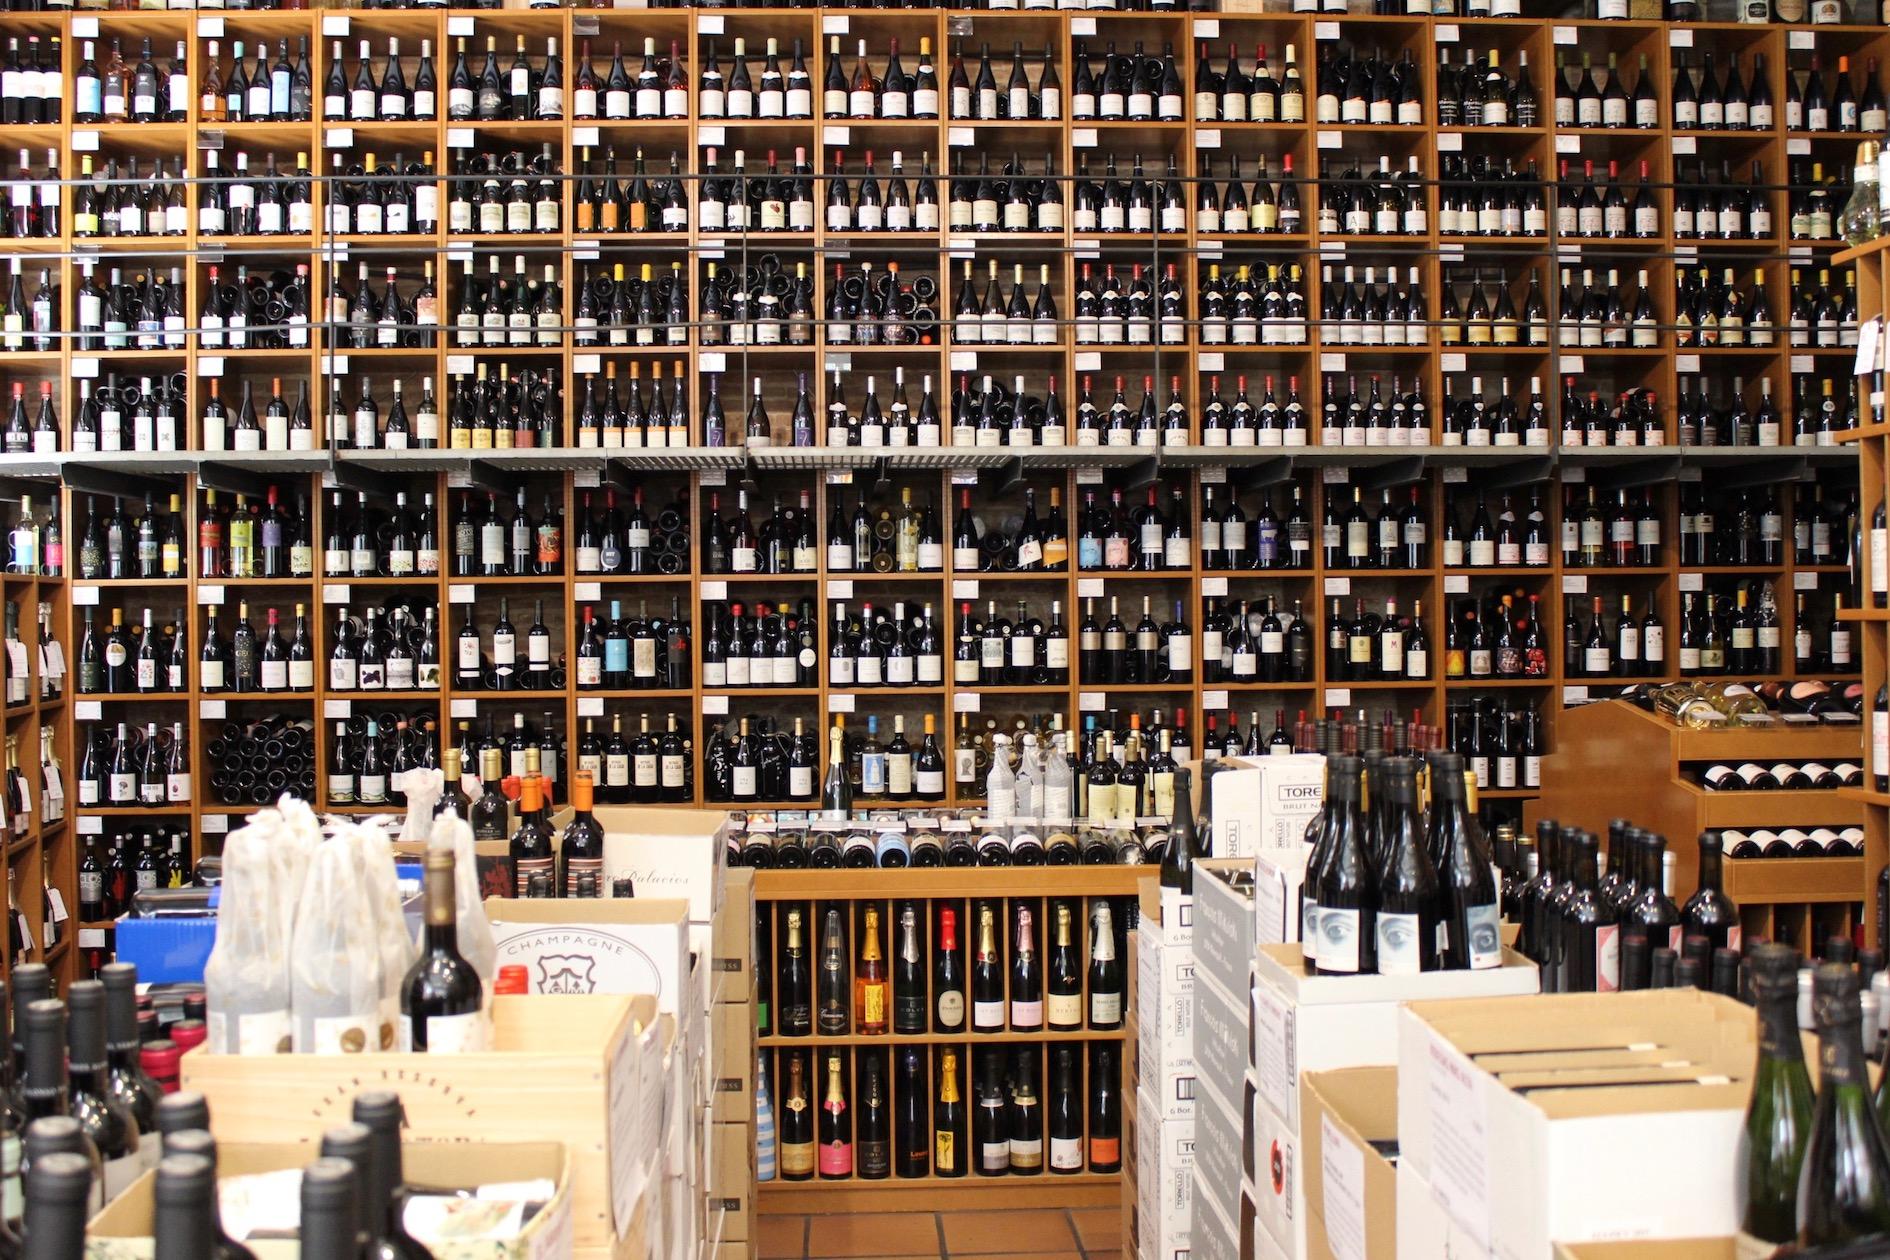 The extraordinary wine collection at Vila Viniteca